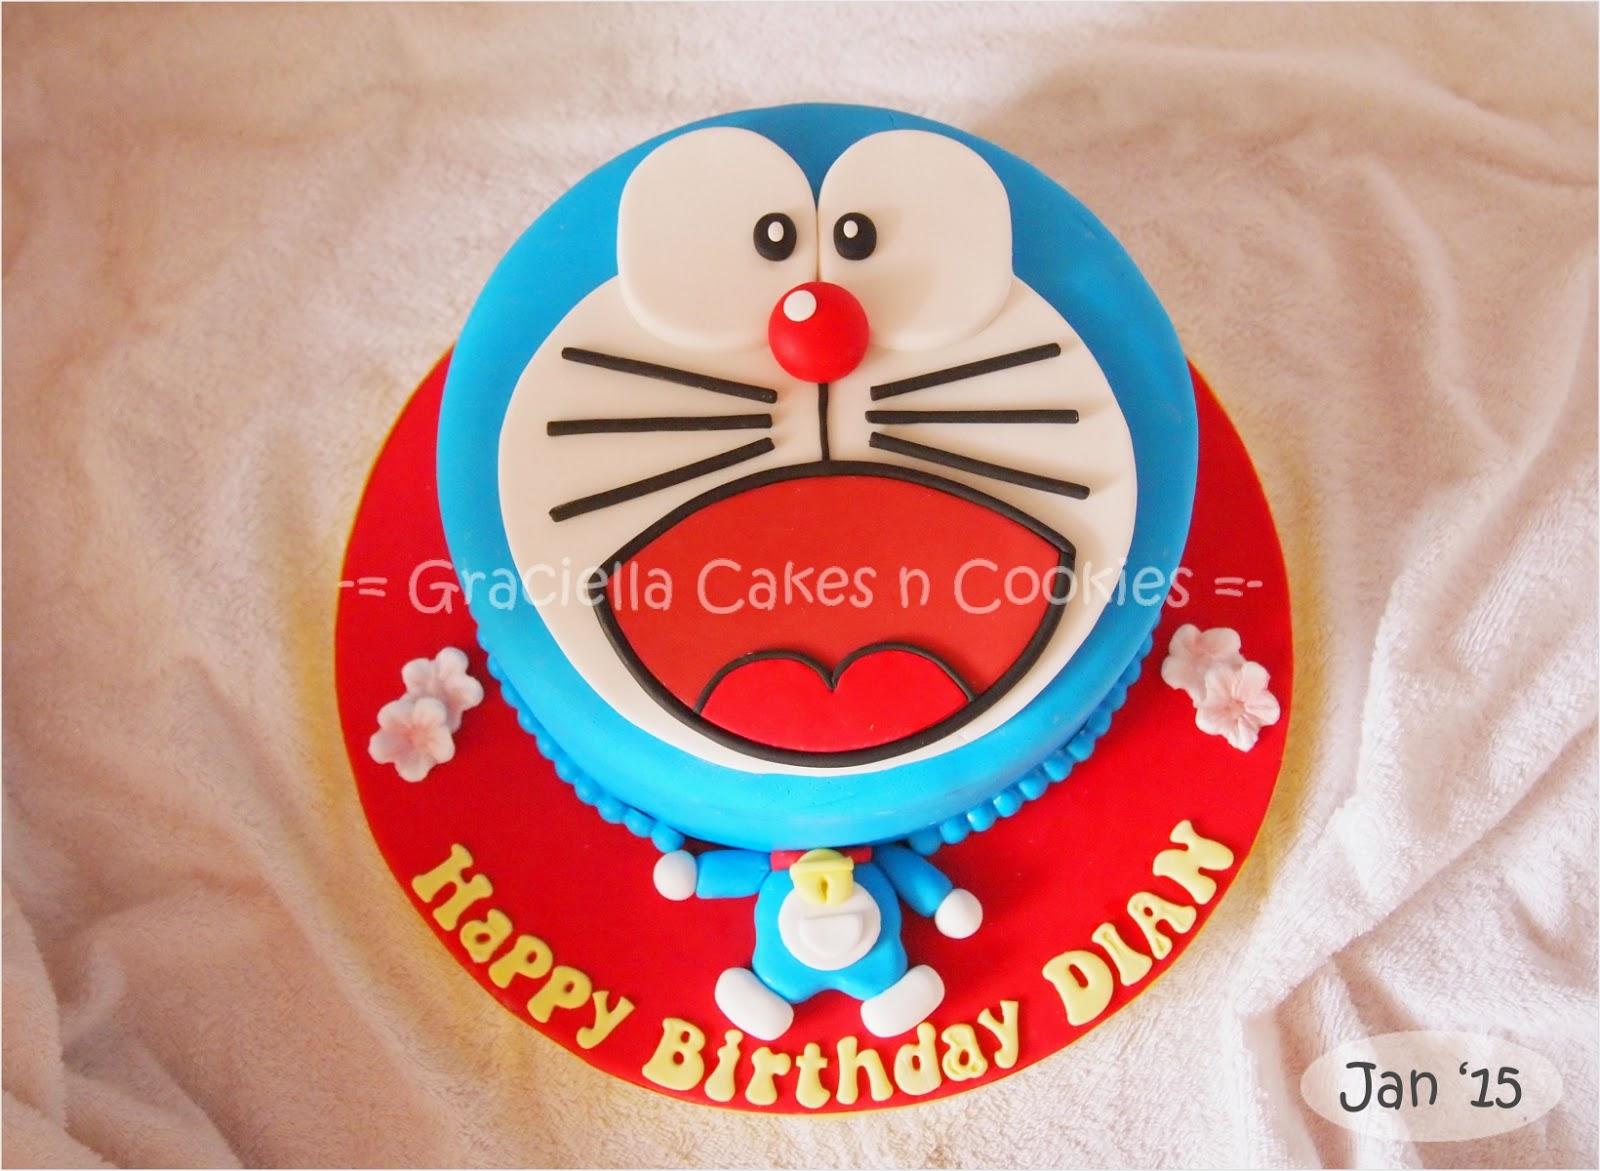 Graciella Cakes Birthday - Manye Cake - Wedding Cupcake